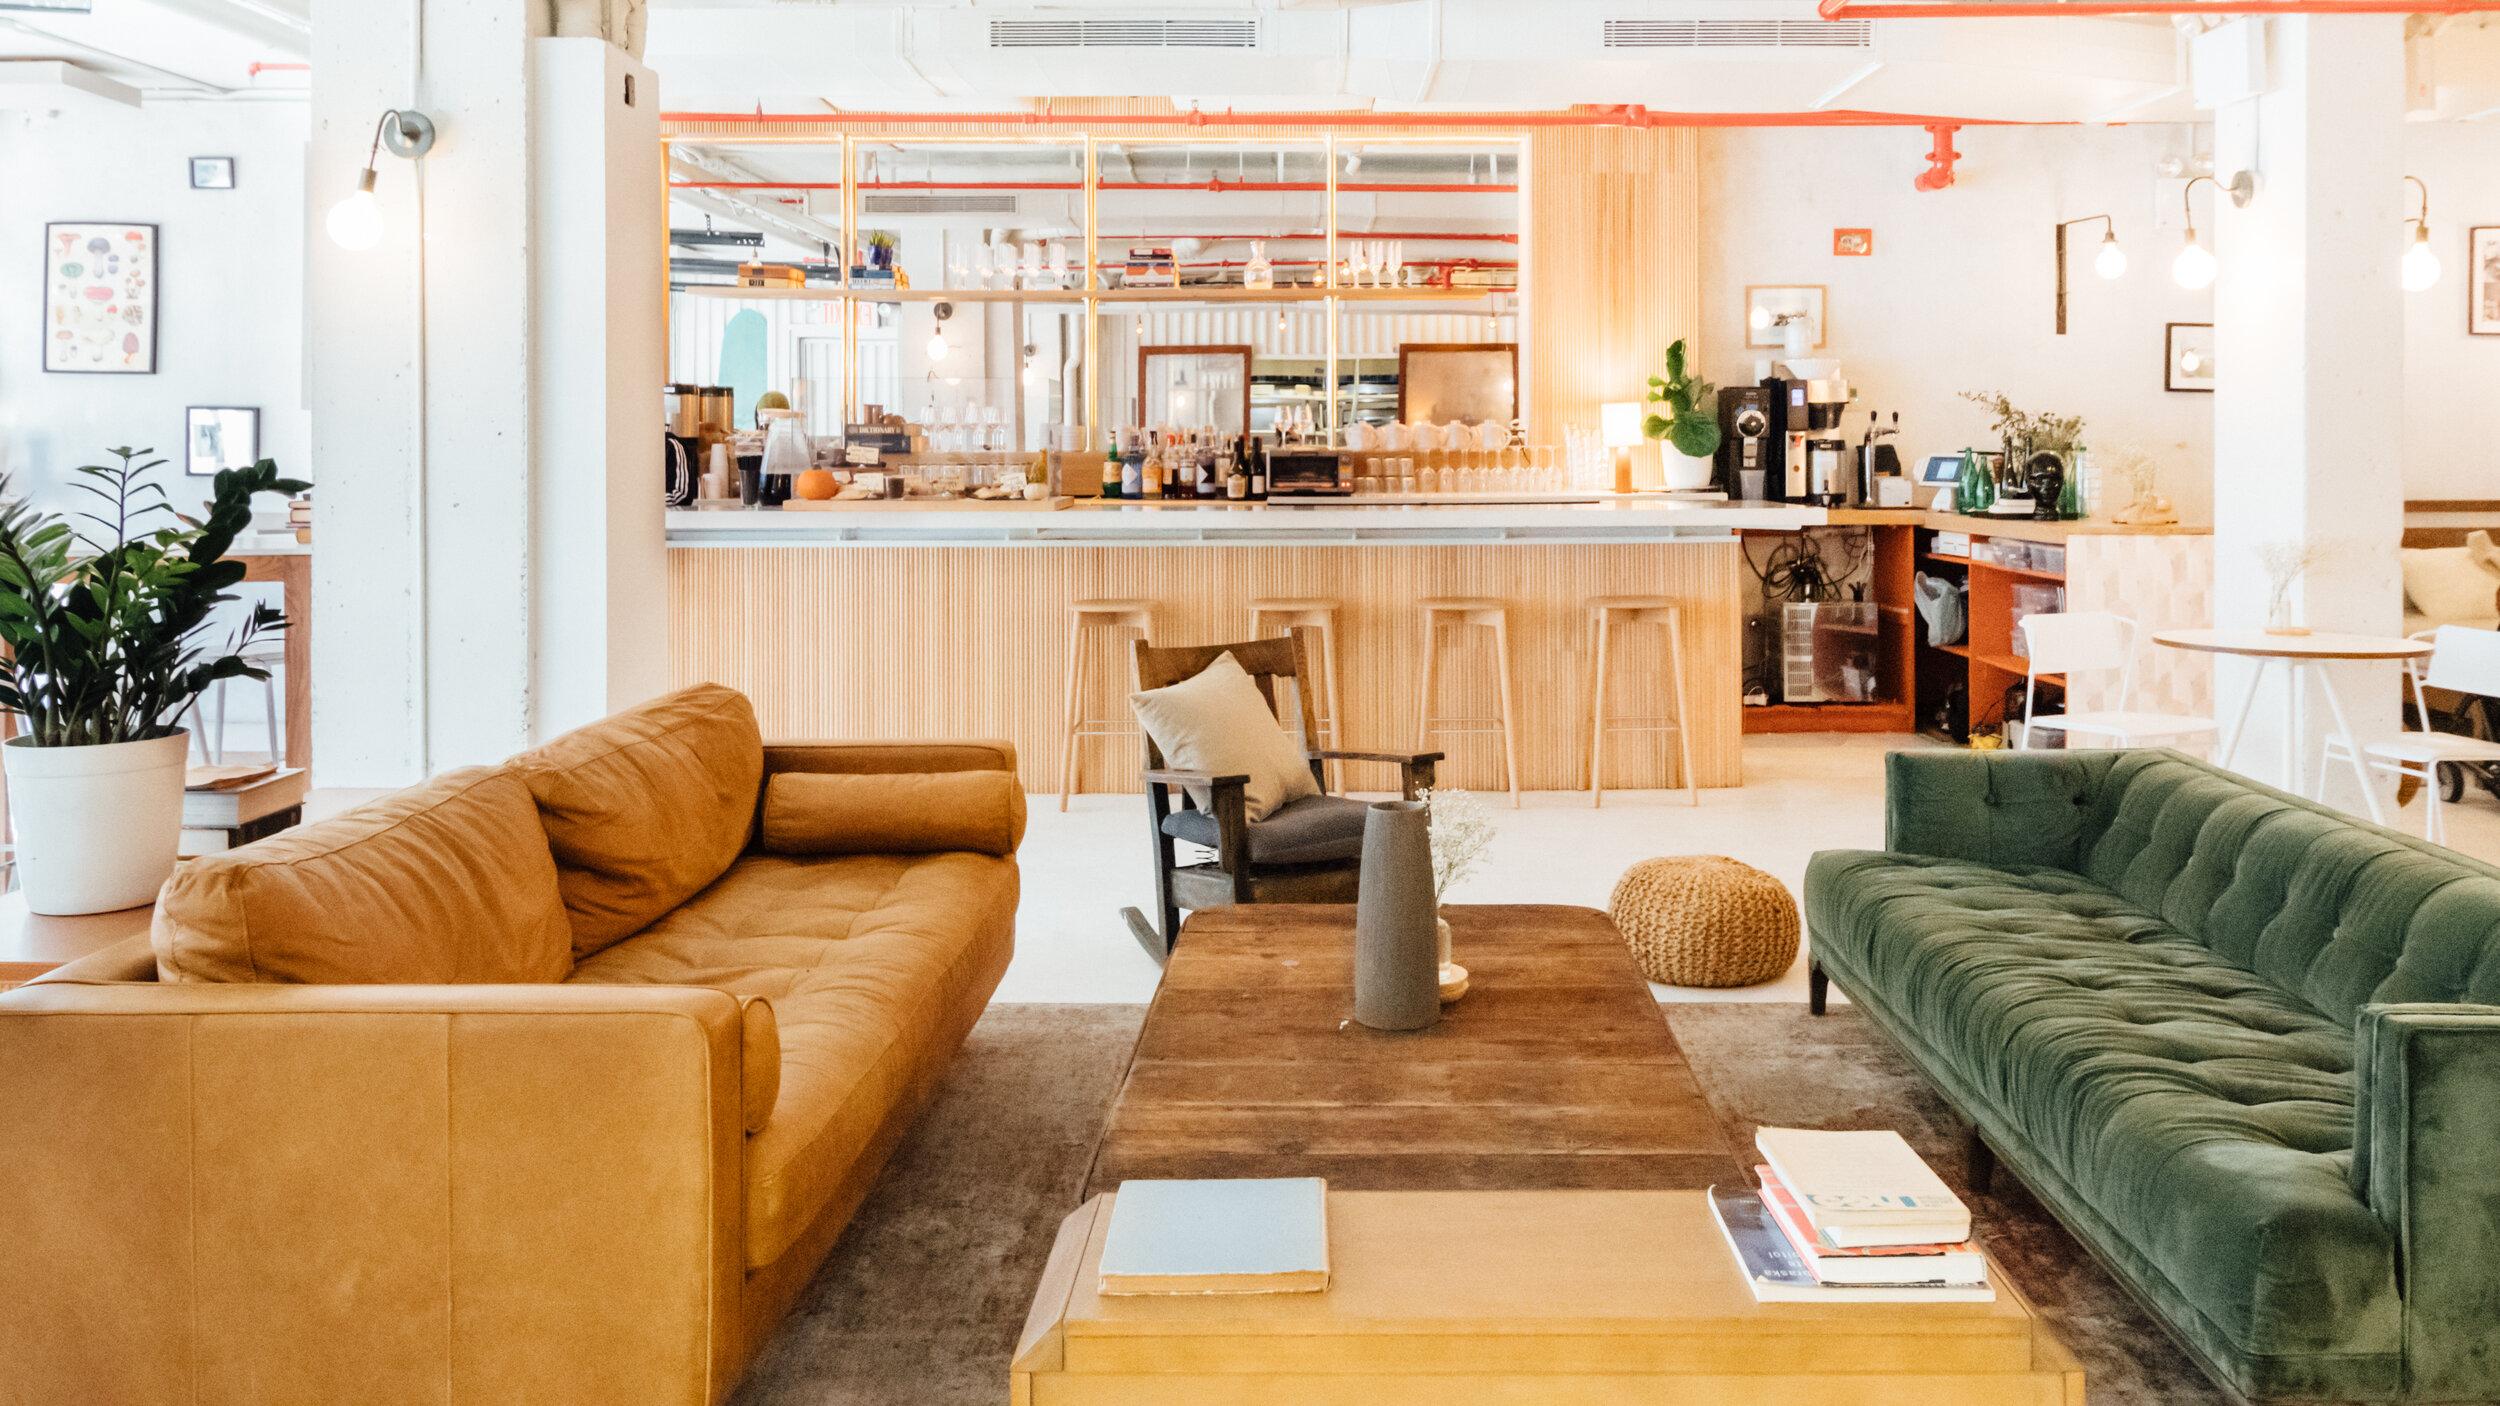 Etiquette_Lounge 1.jpg